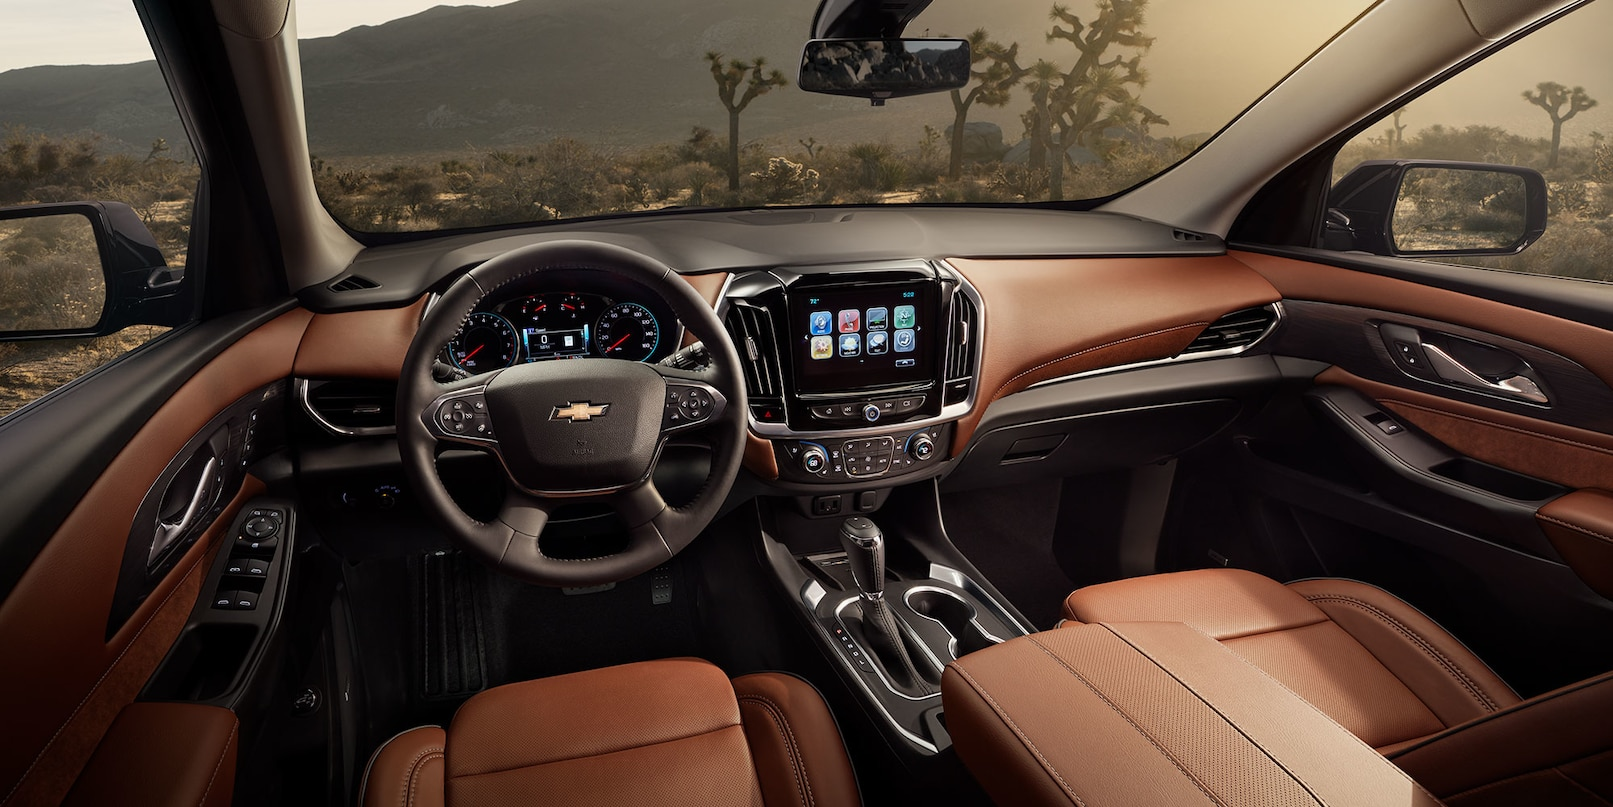 Interior of the 2019 Chevrolet Traverse